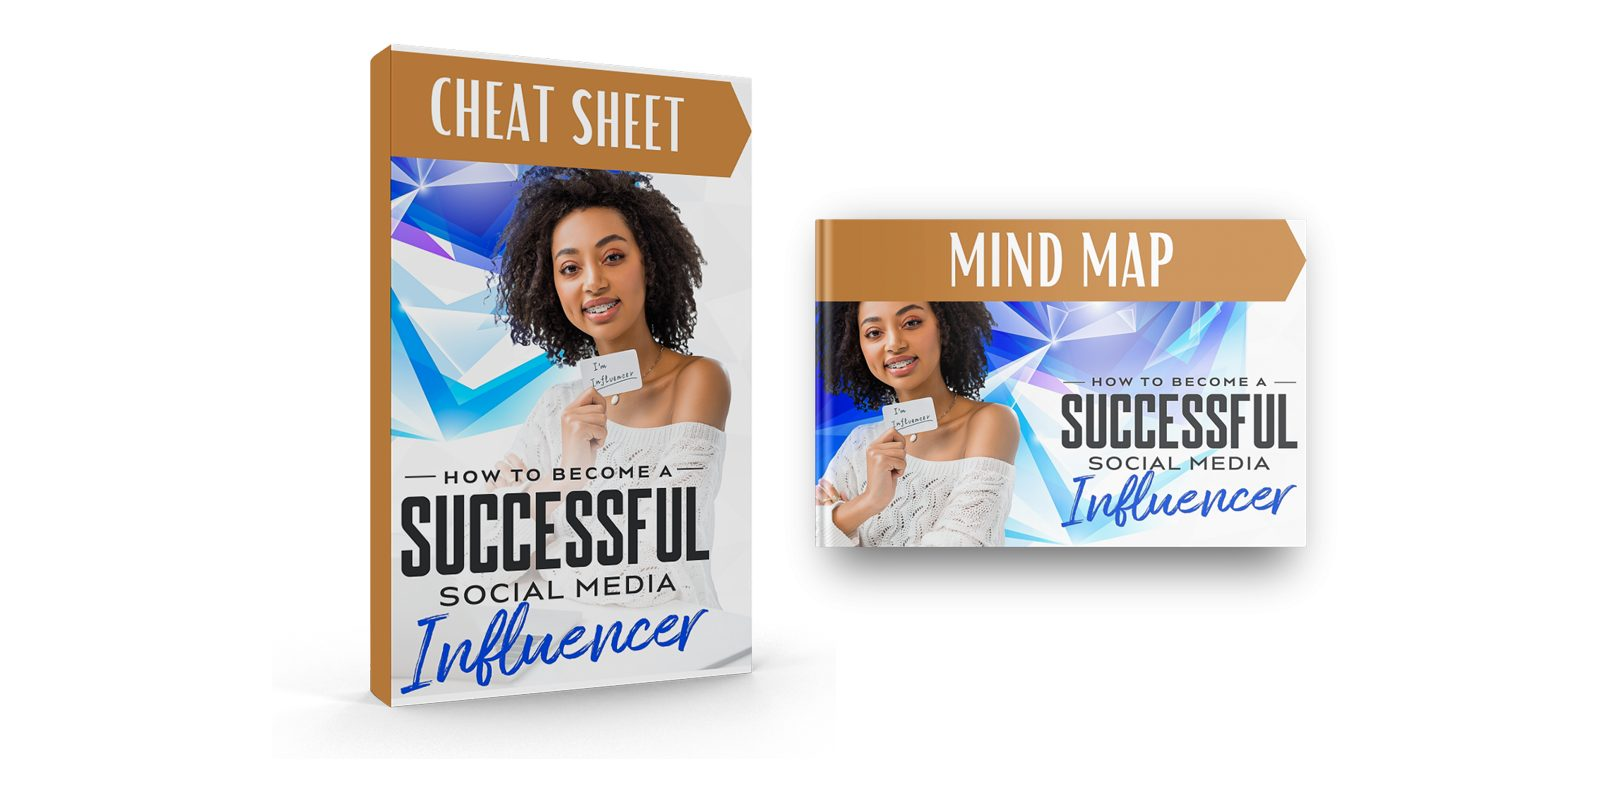 Hyper Influencer Marketing bonus